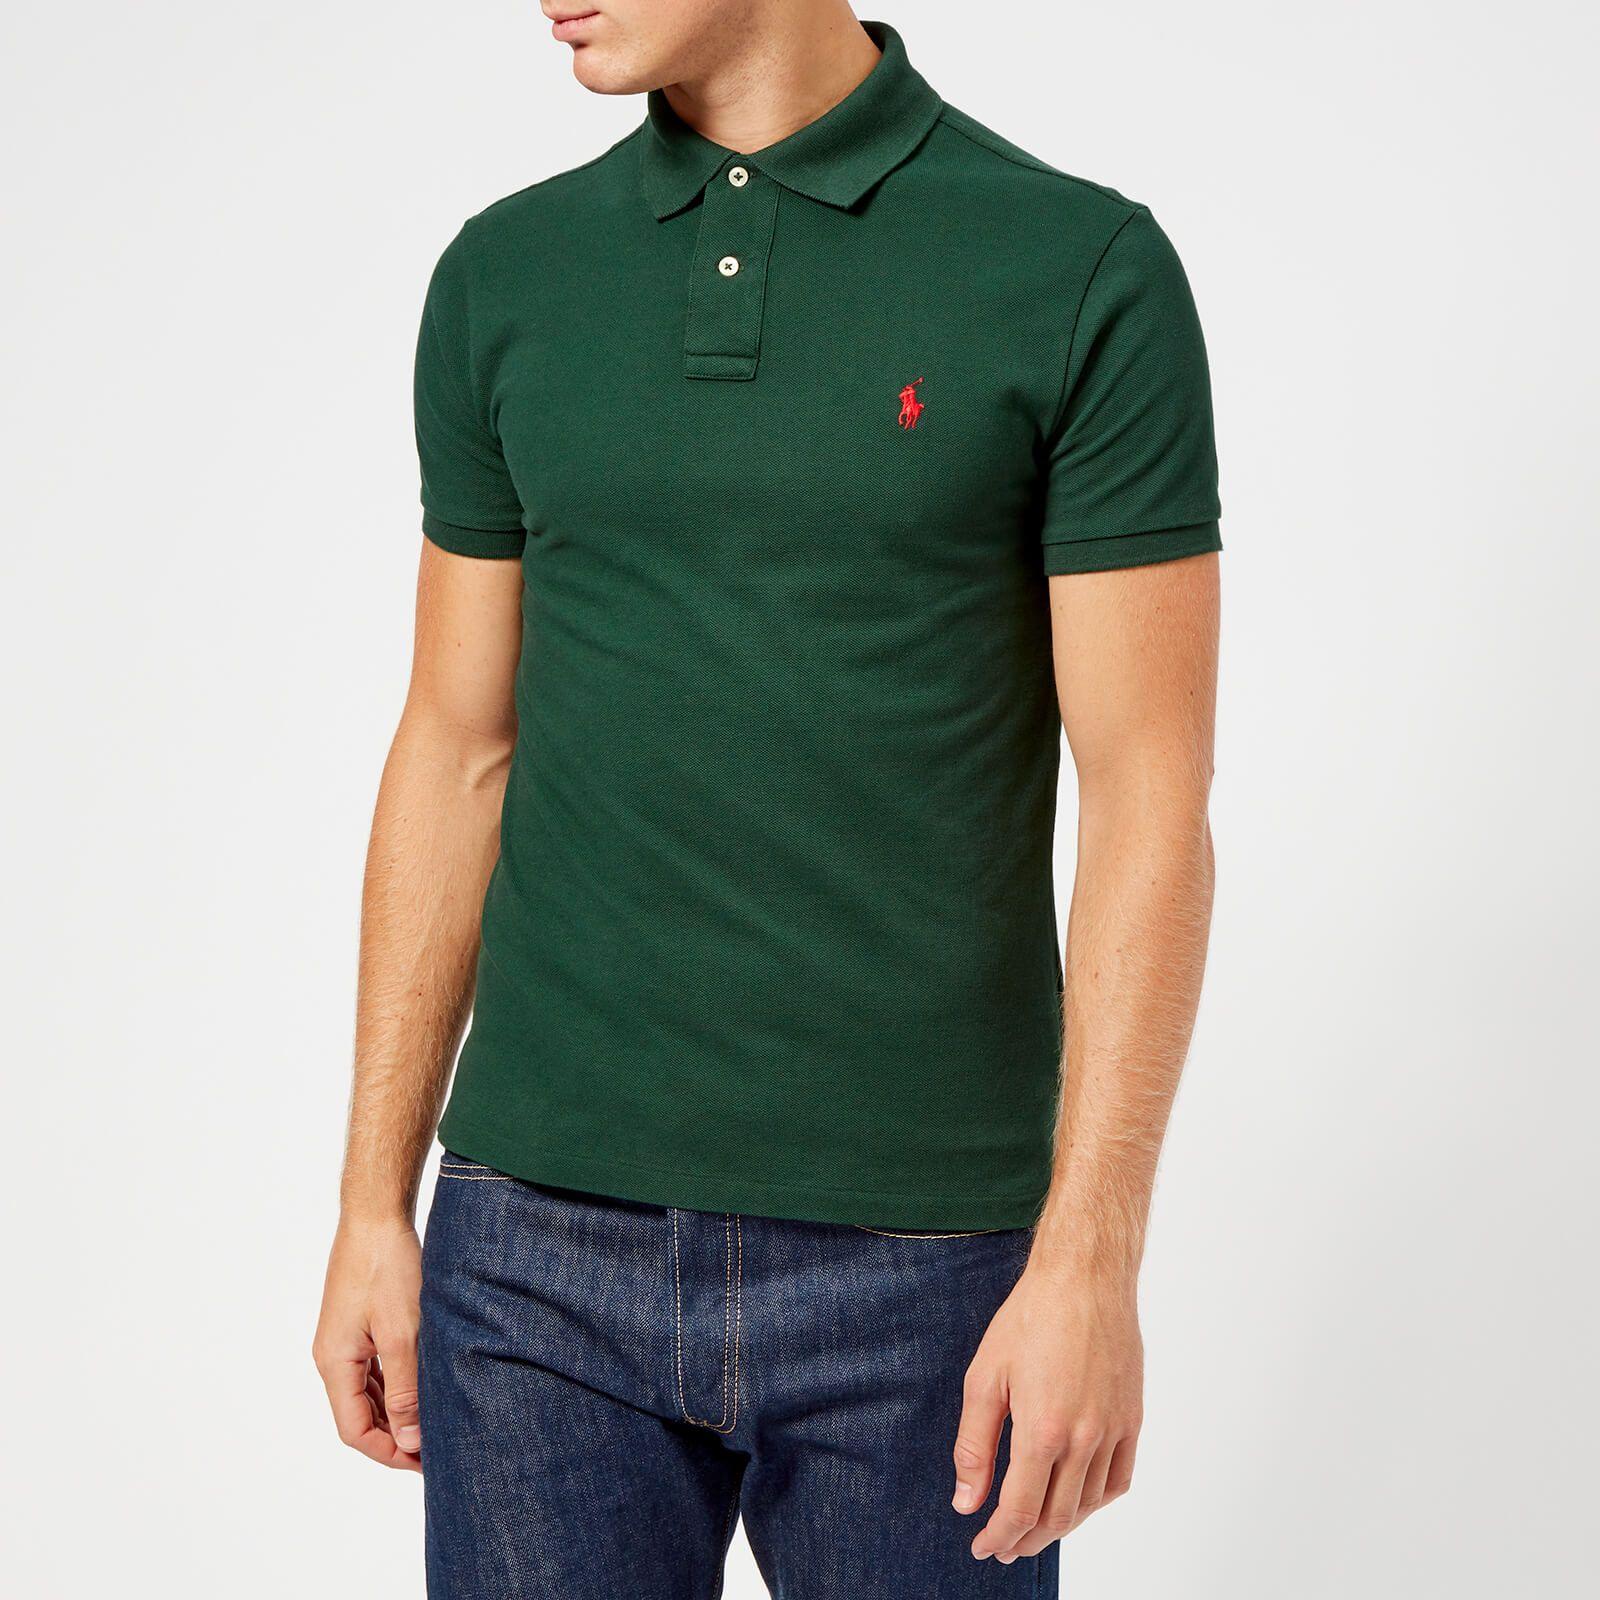 Polo ralph lauren men's slim fit short sleeve polo shirt - college ...